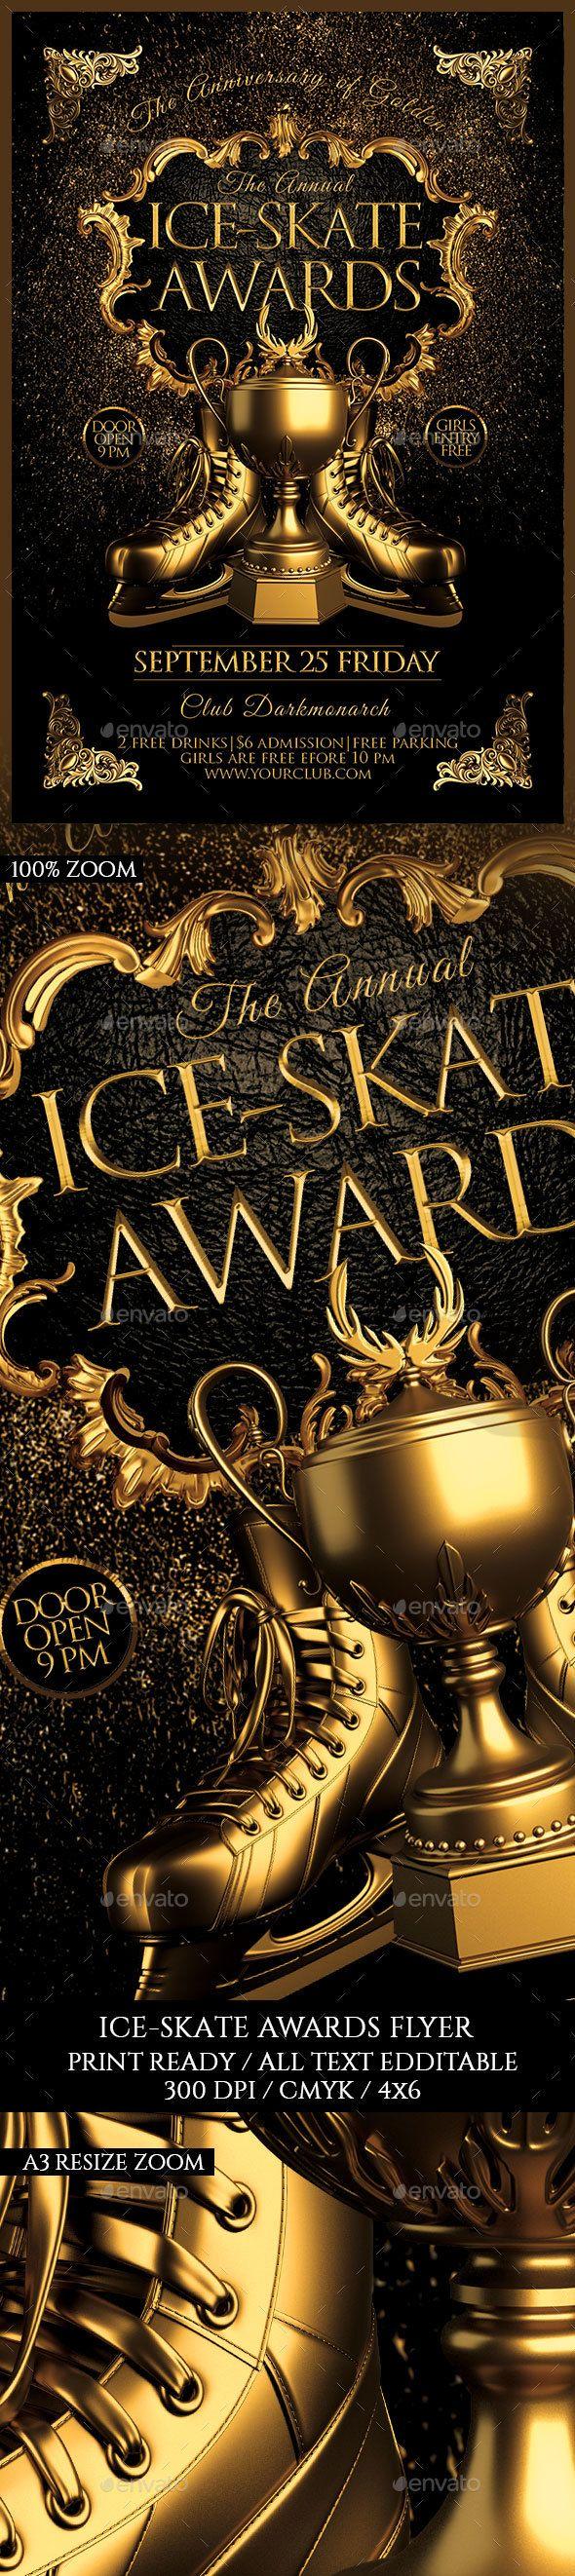 Ice Skate Awards Flyer Template PSD